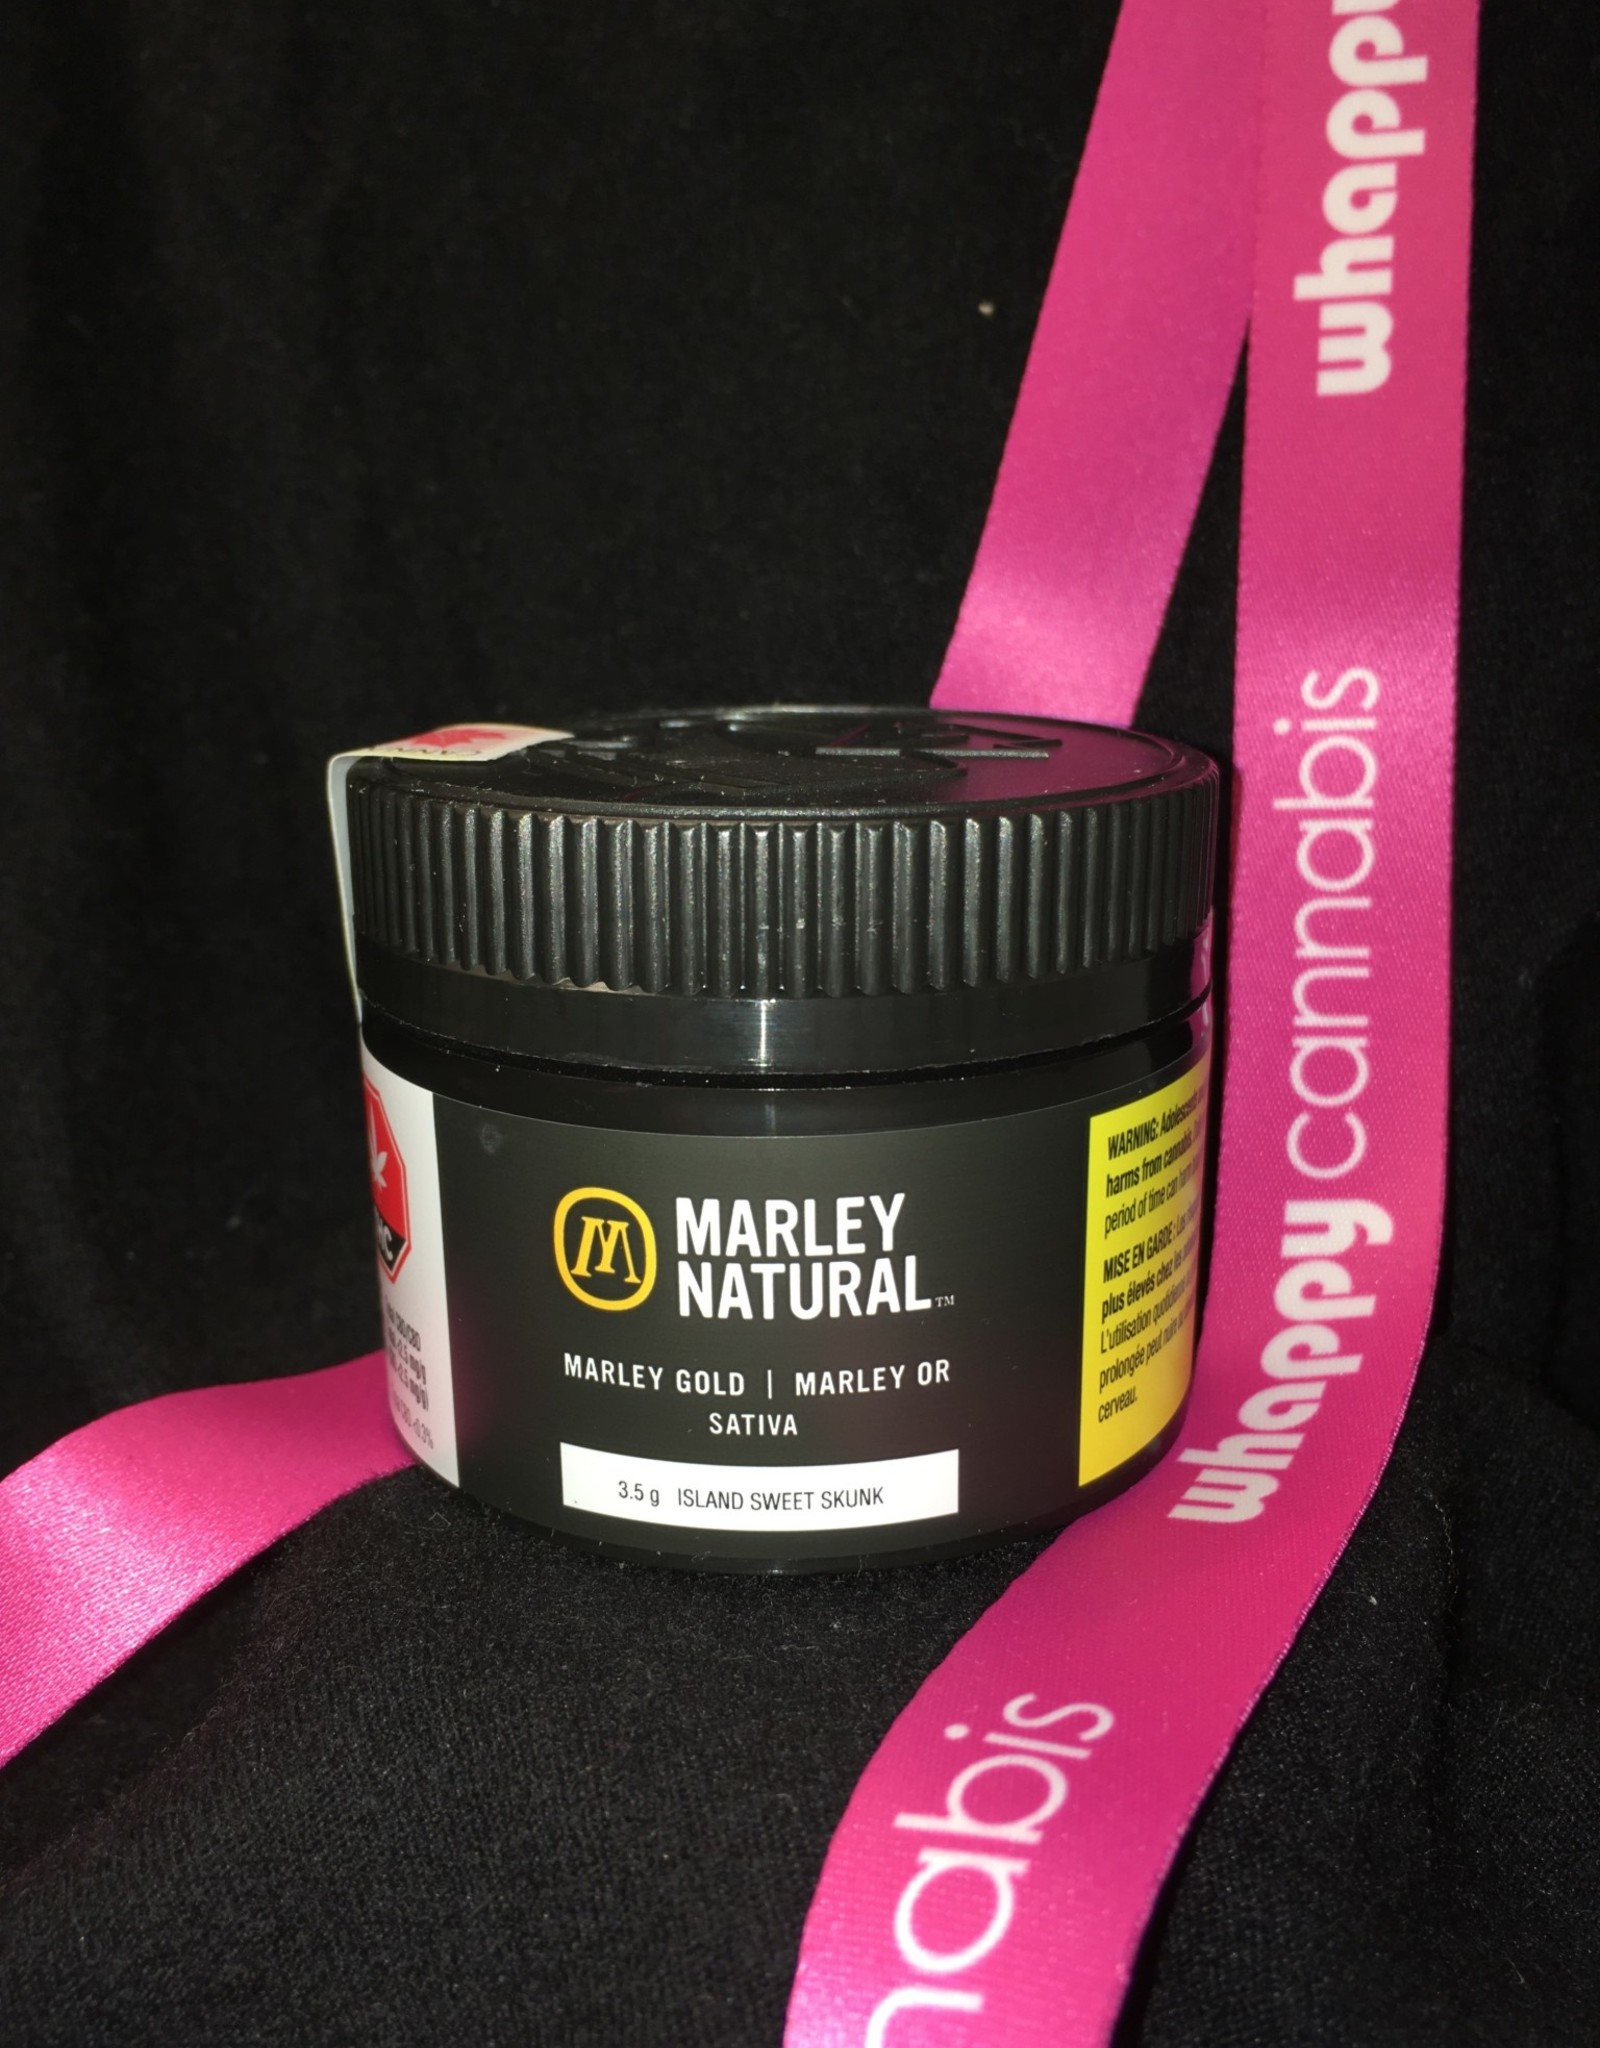 Marley Natural Marley Natural - Marley Gold Sativa 3.5g